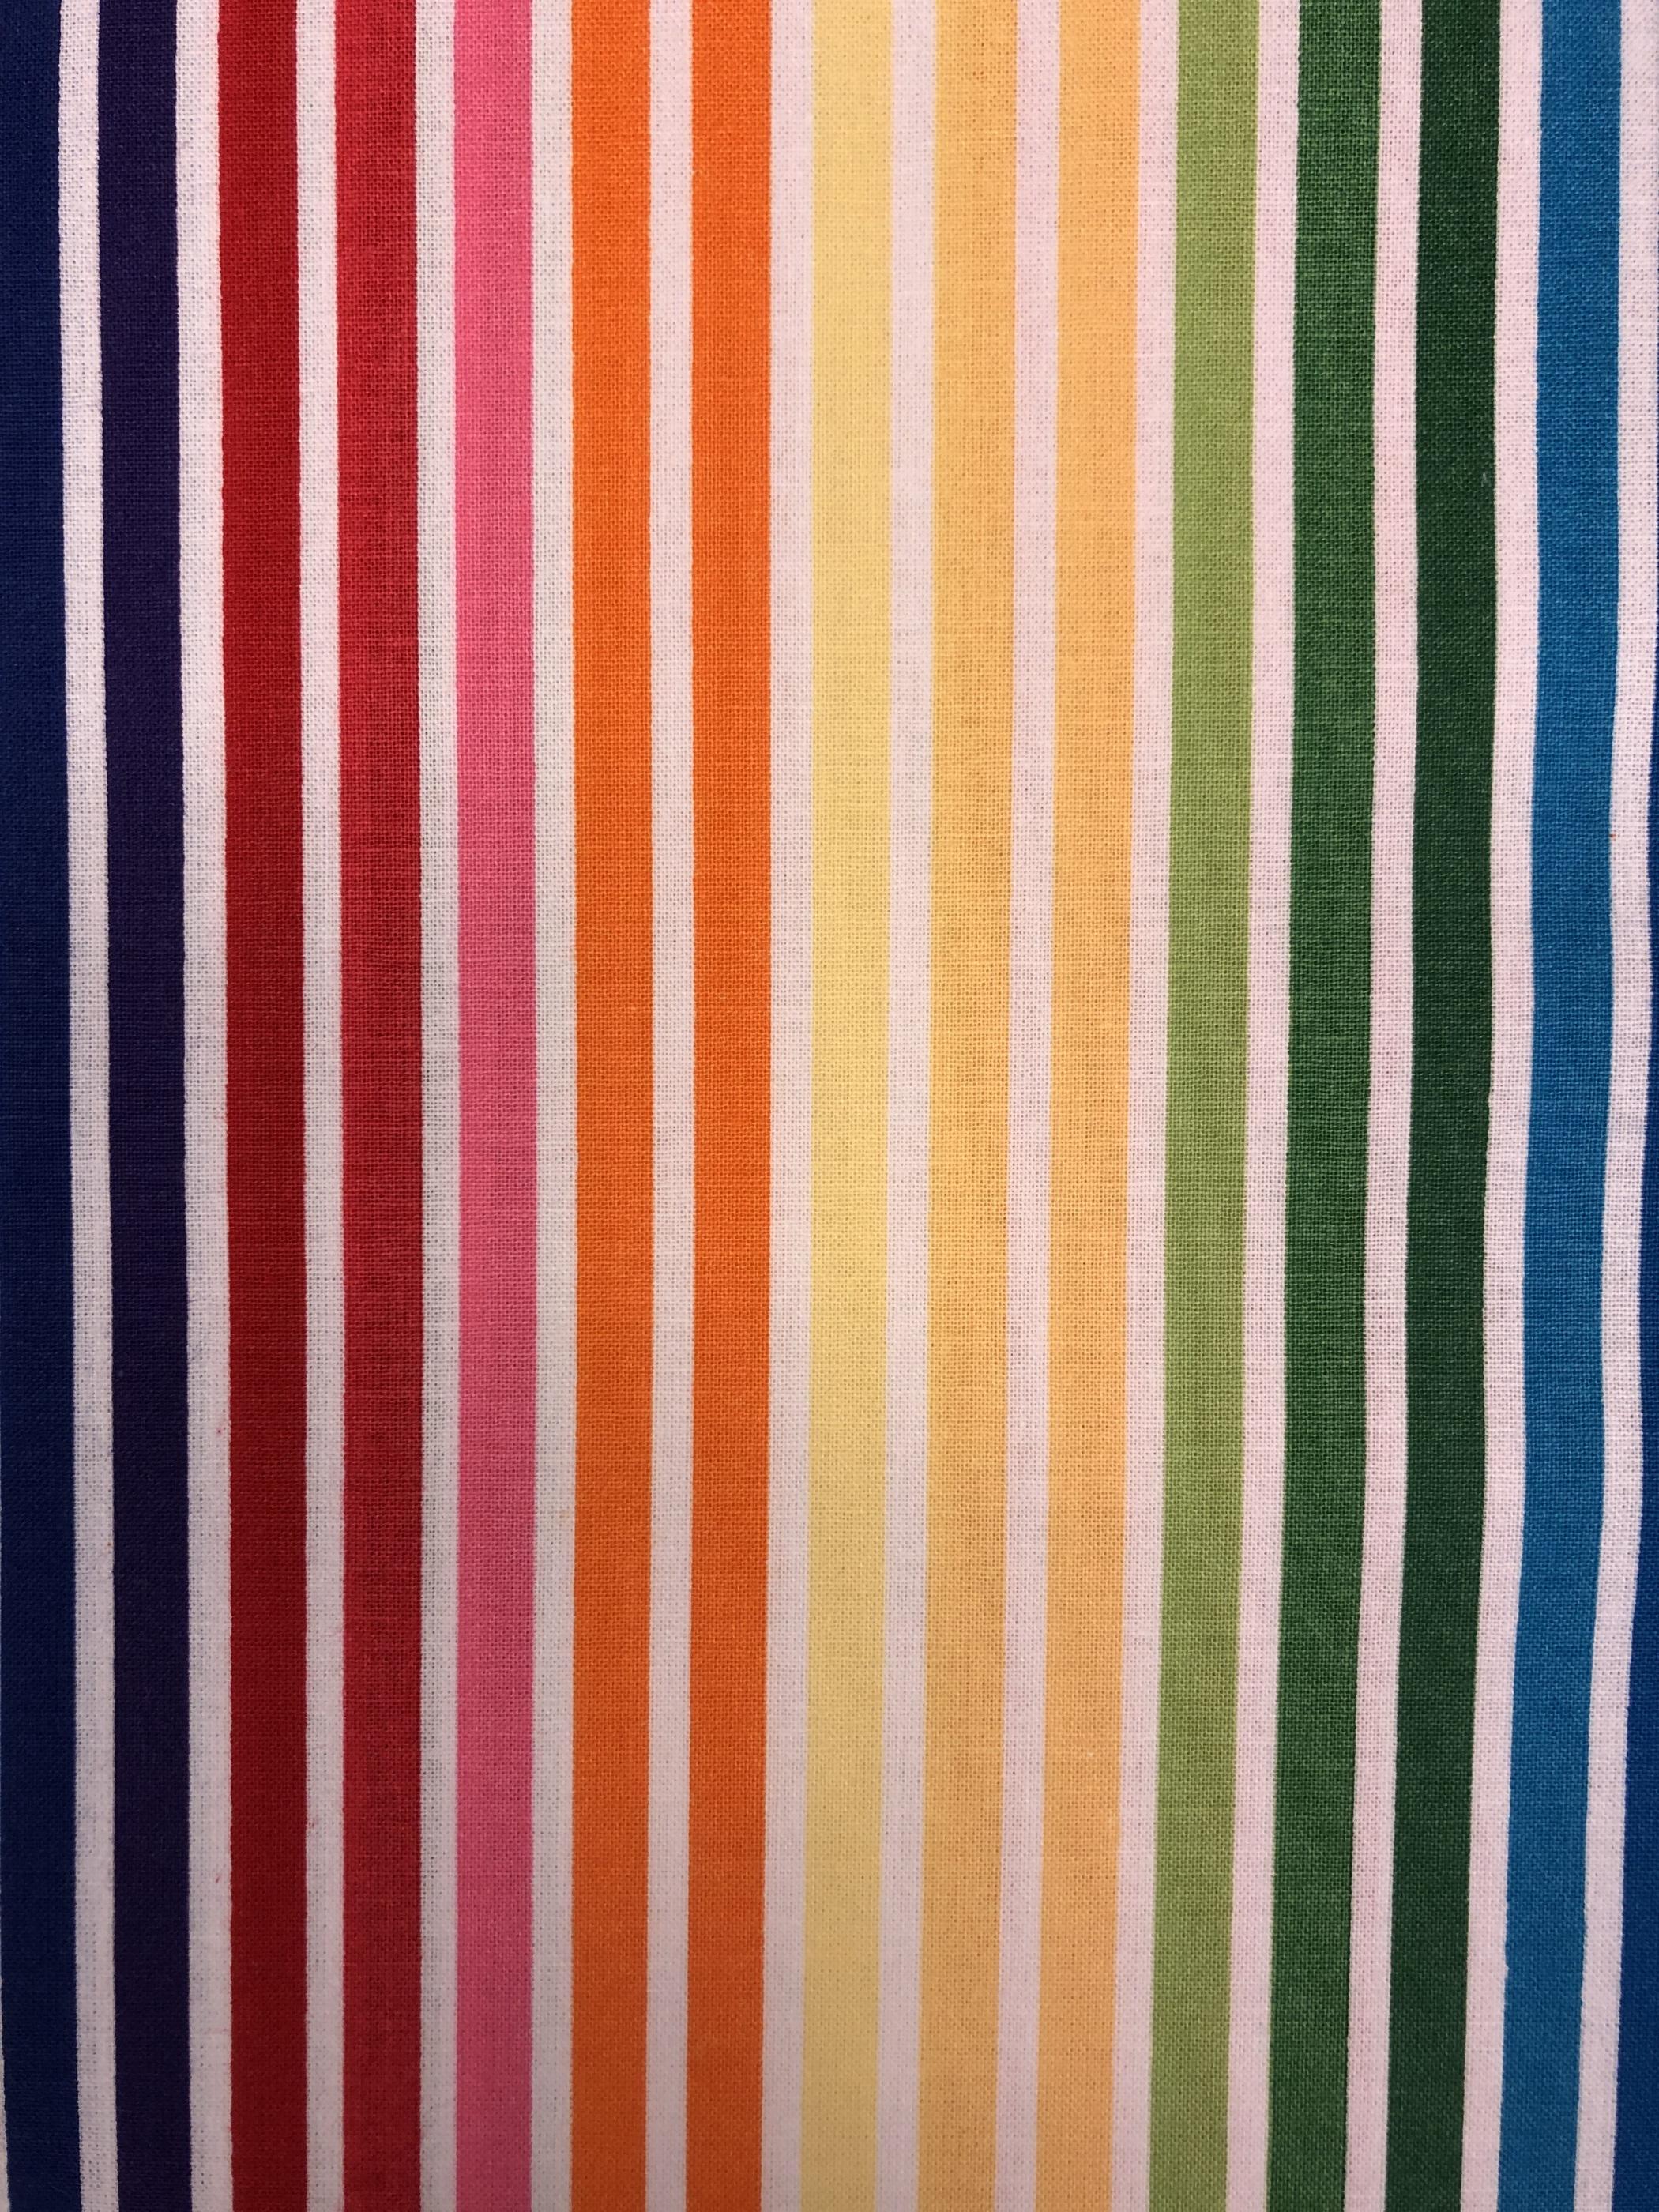 regnbåge regnbågsrand färgglad randig bomullsväv metervara tyglust laholm